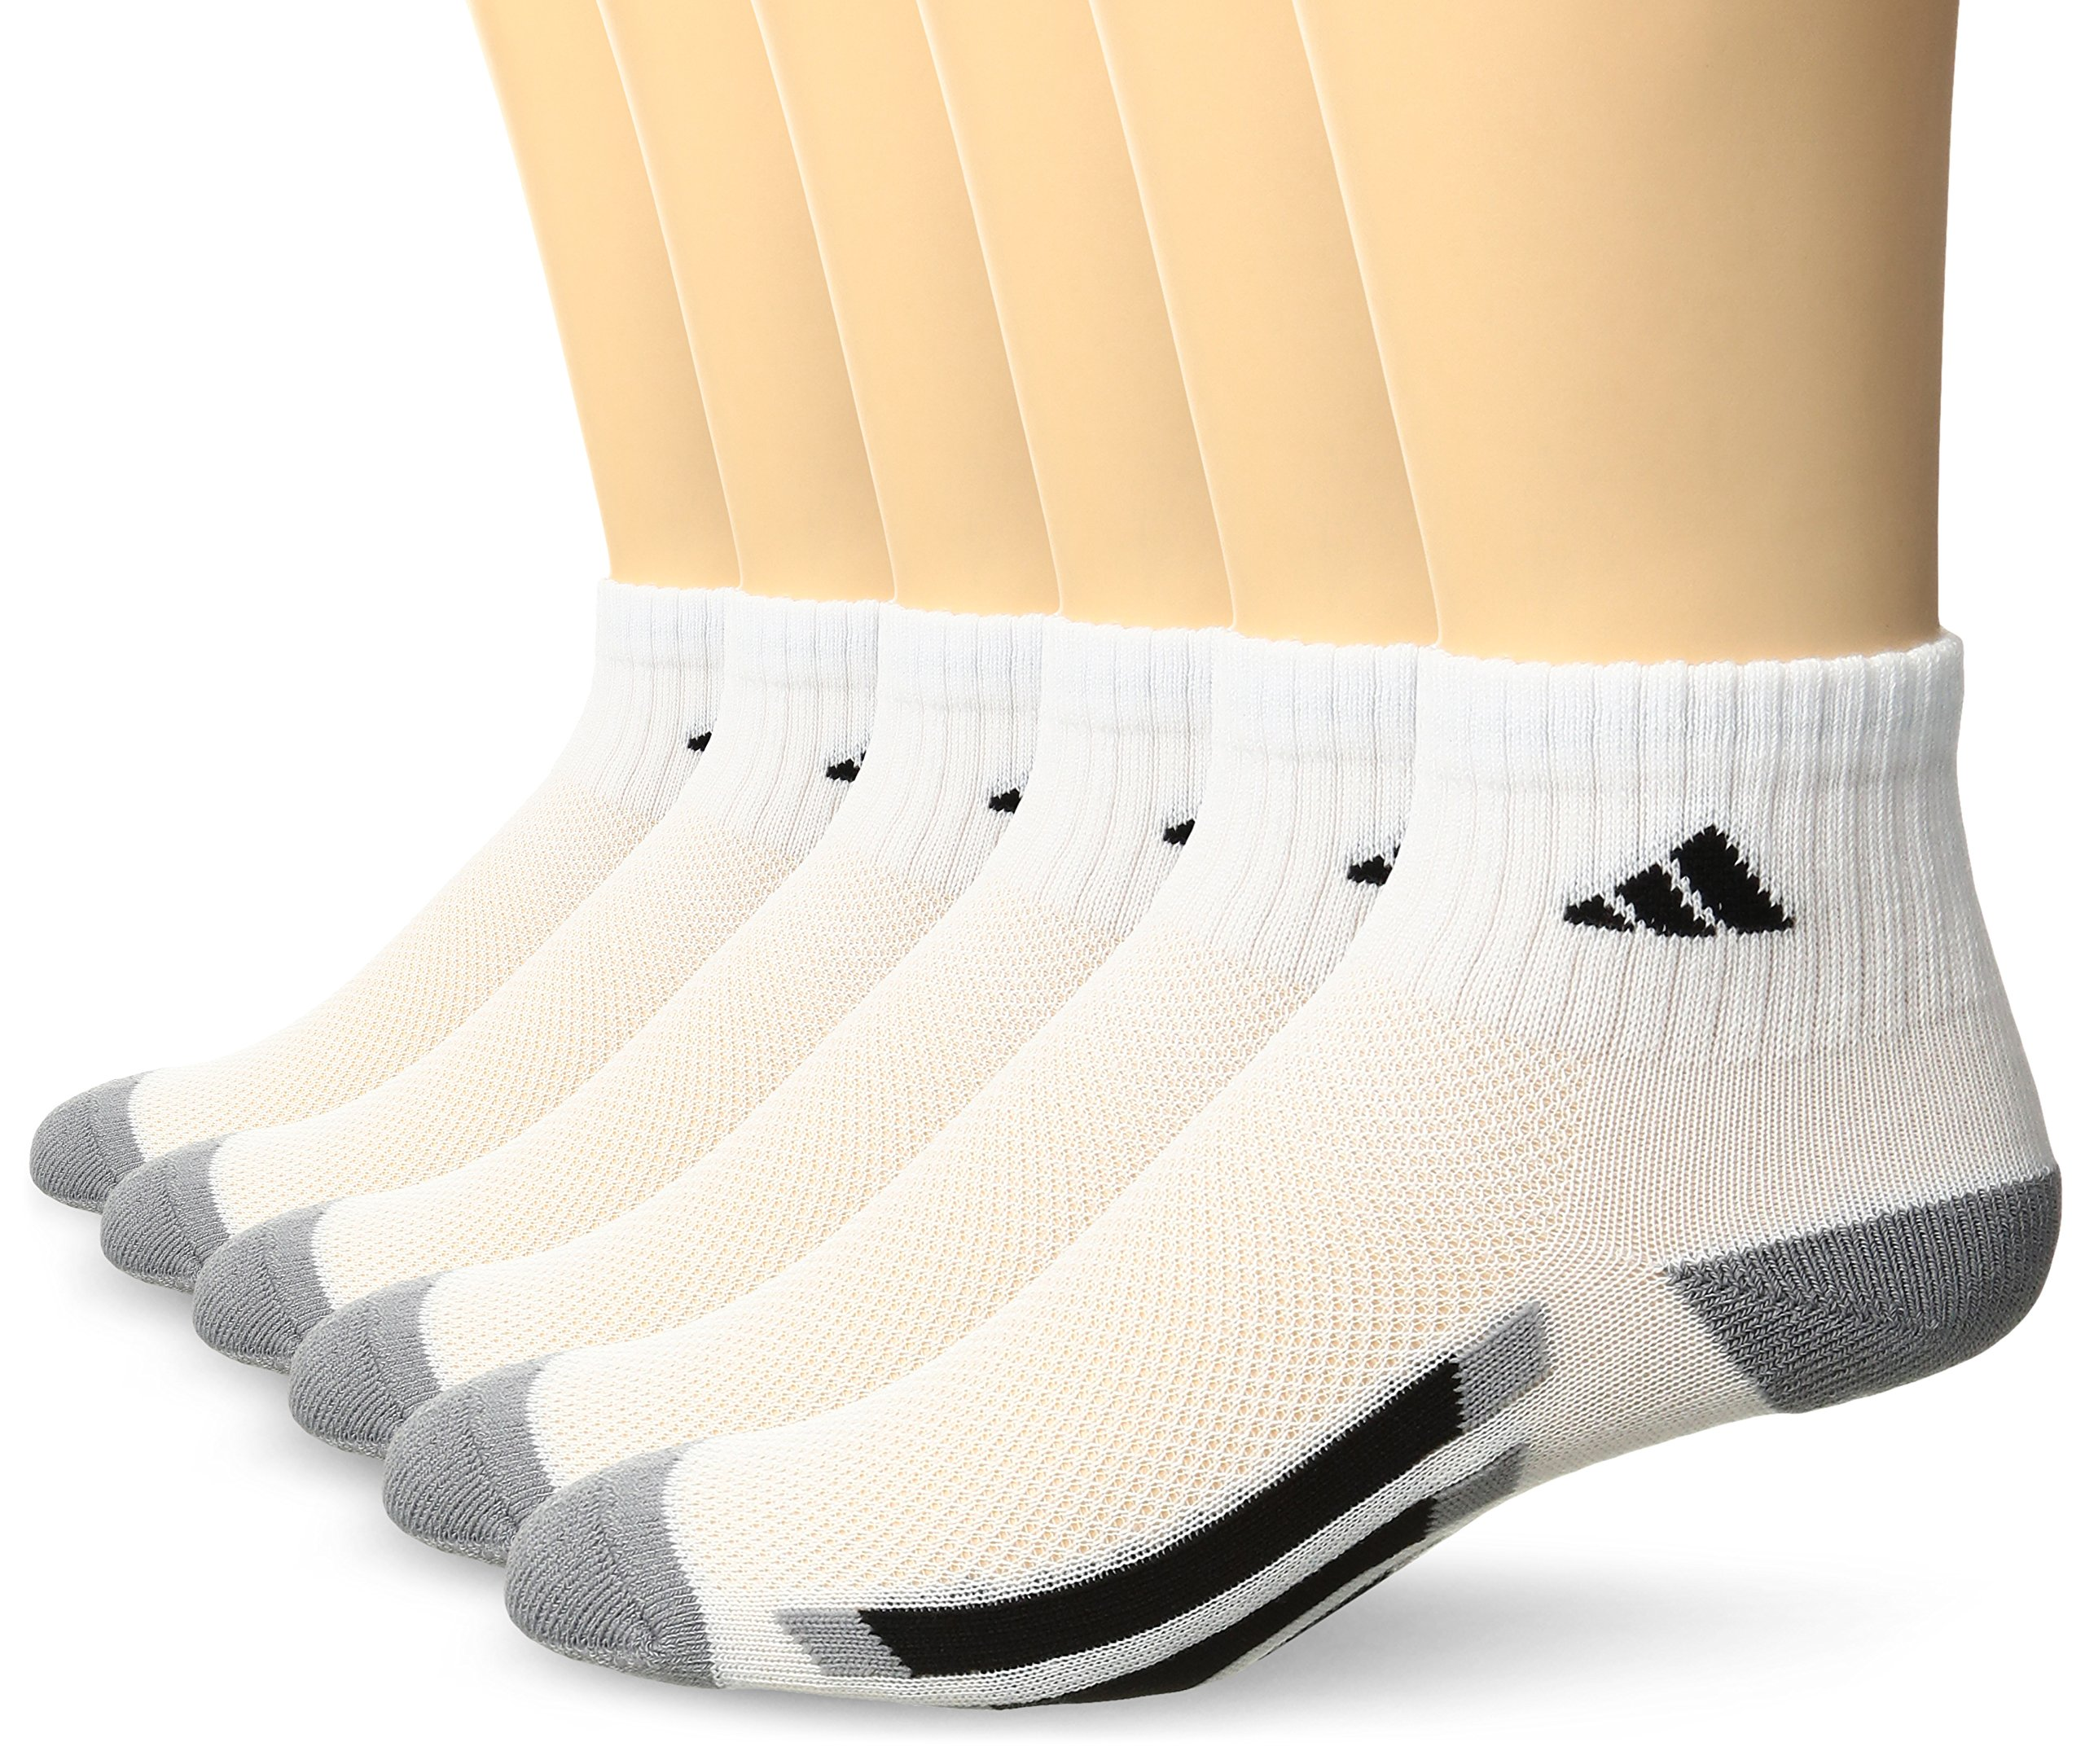 adidas Kids' - Boys/Girls Cushioned Quarter Socks (6-Pair), White/Black/Light Onyx, Large